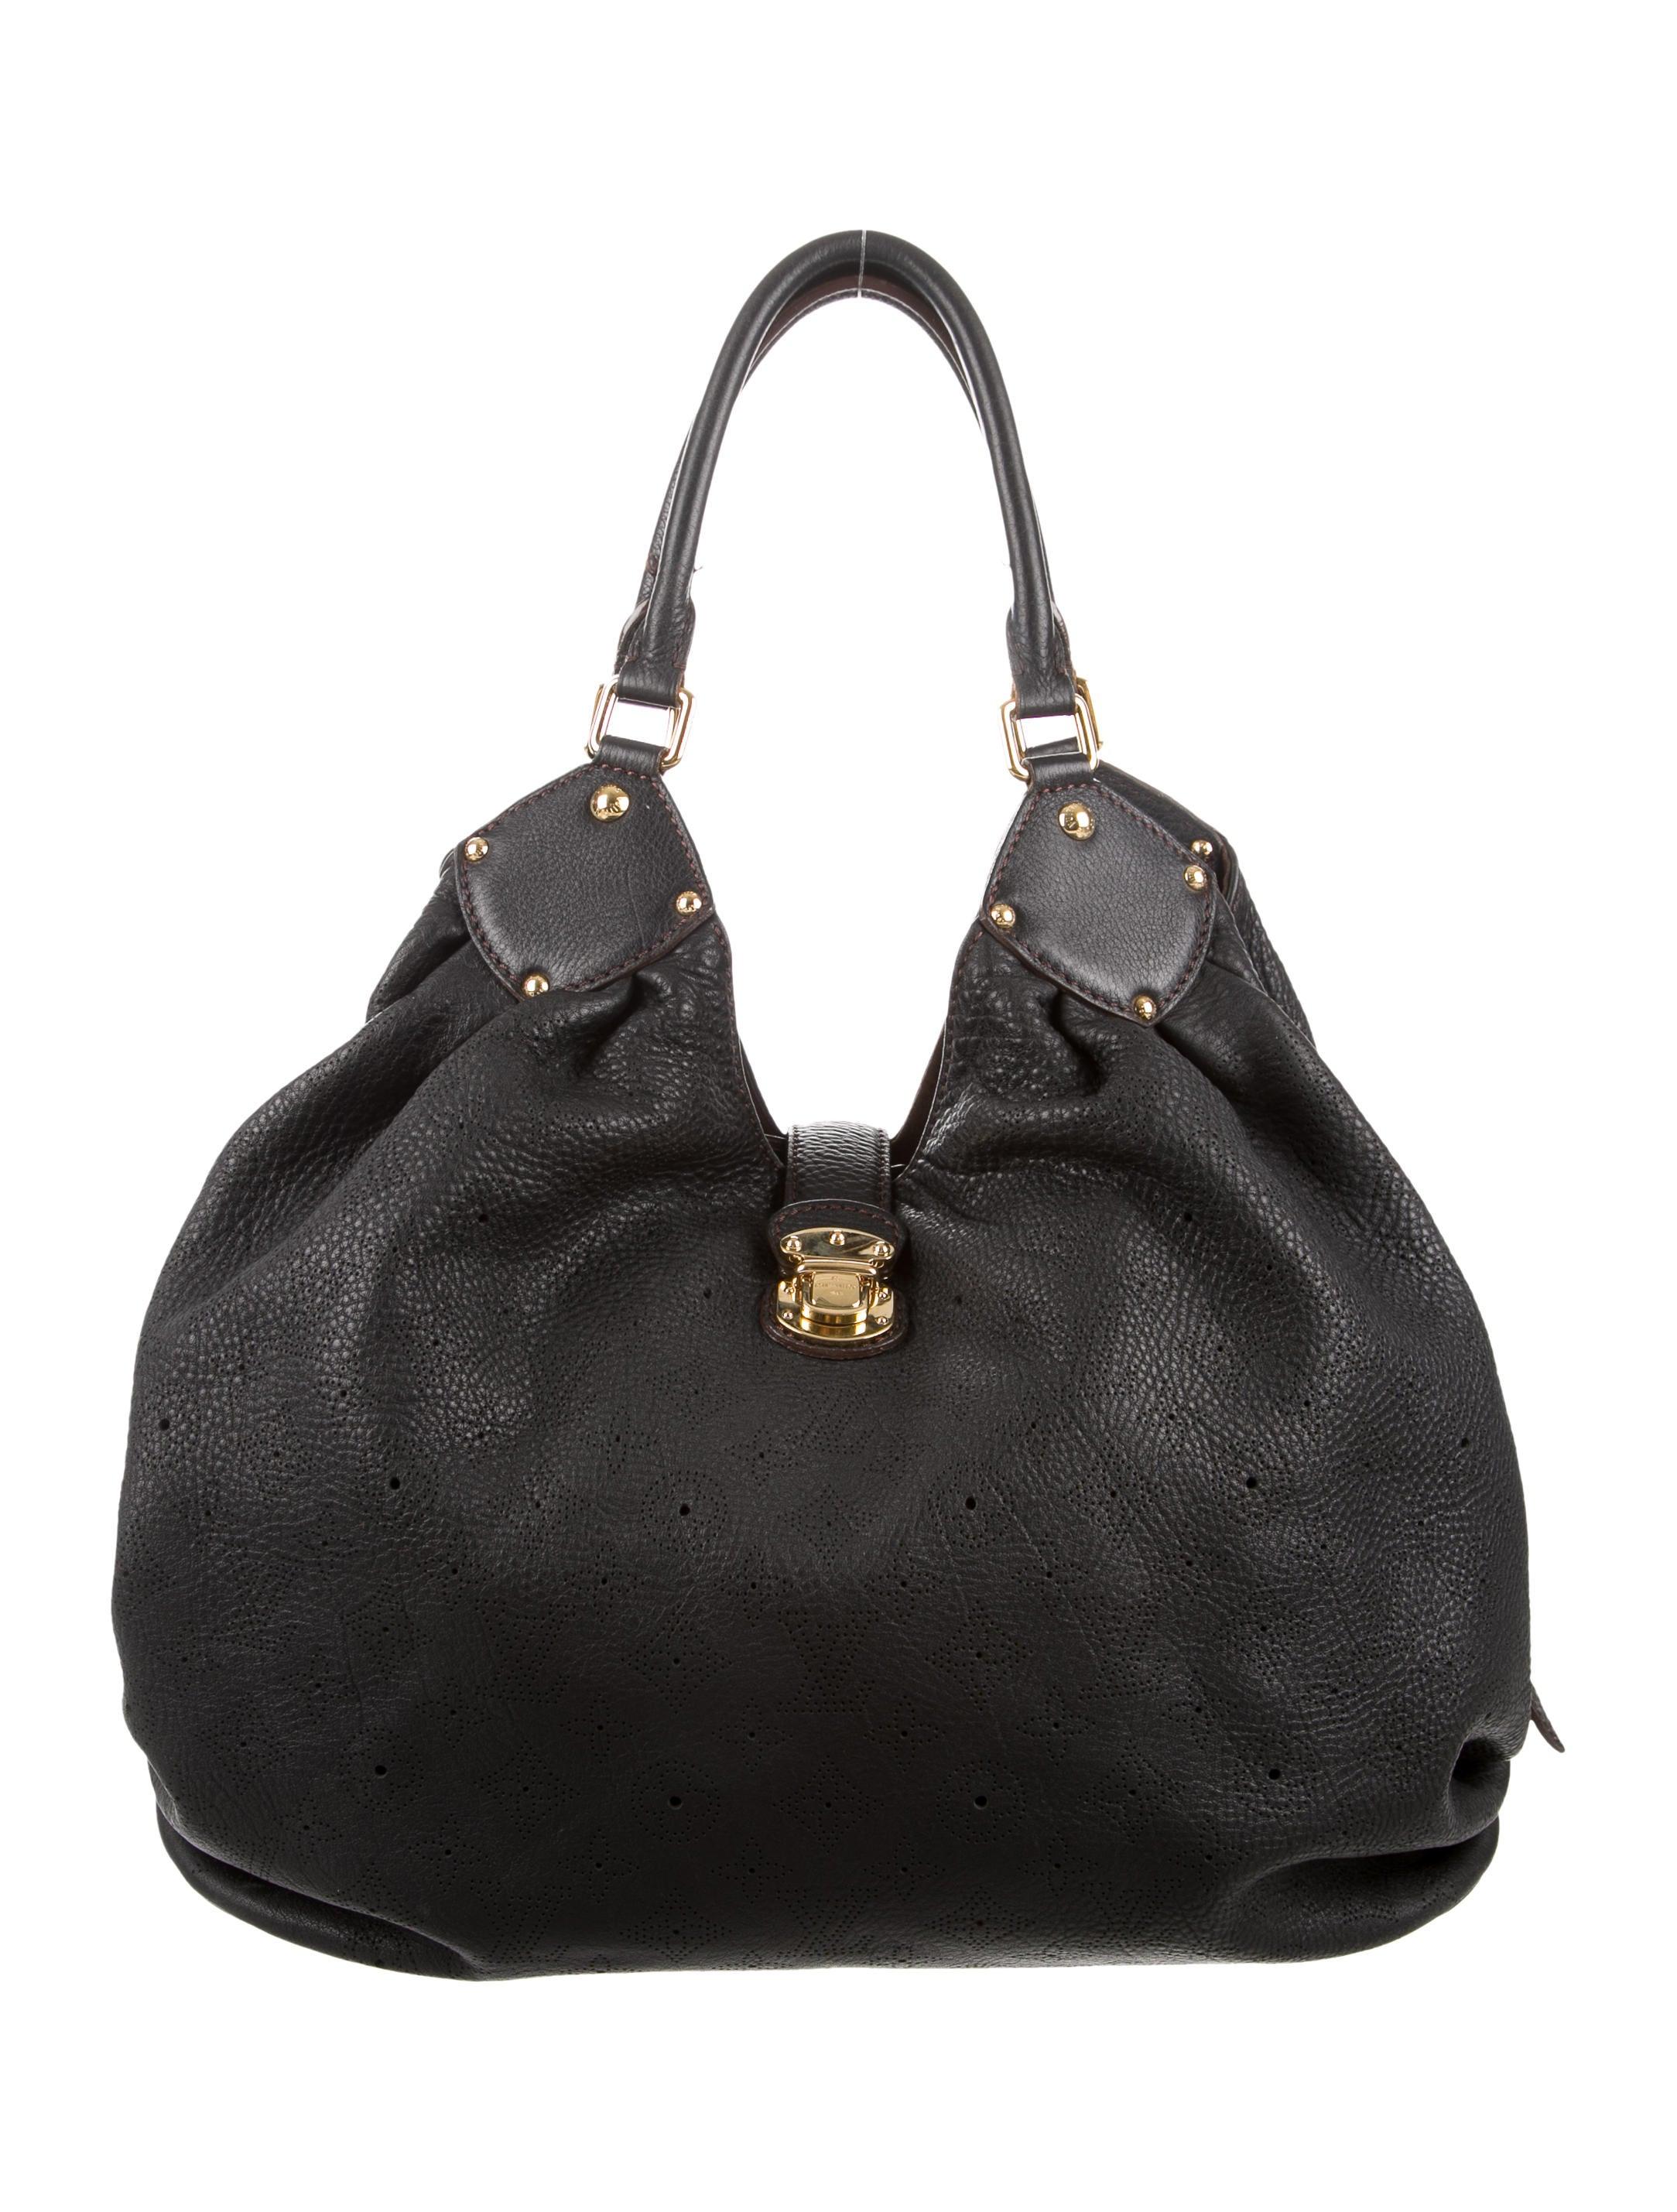 326faf42cf67 Louis Vuitton Mahina Black Leather Hobo Xl